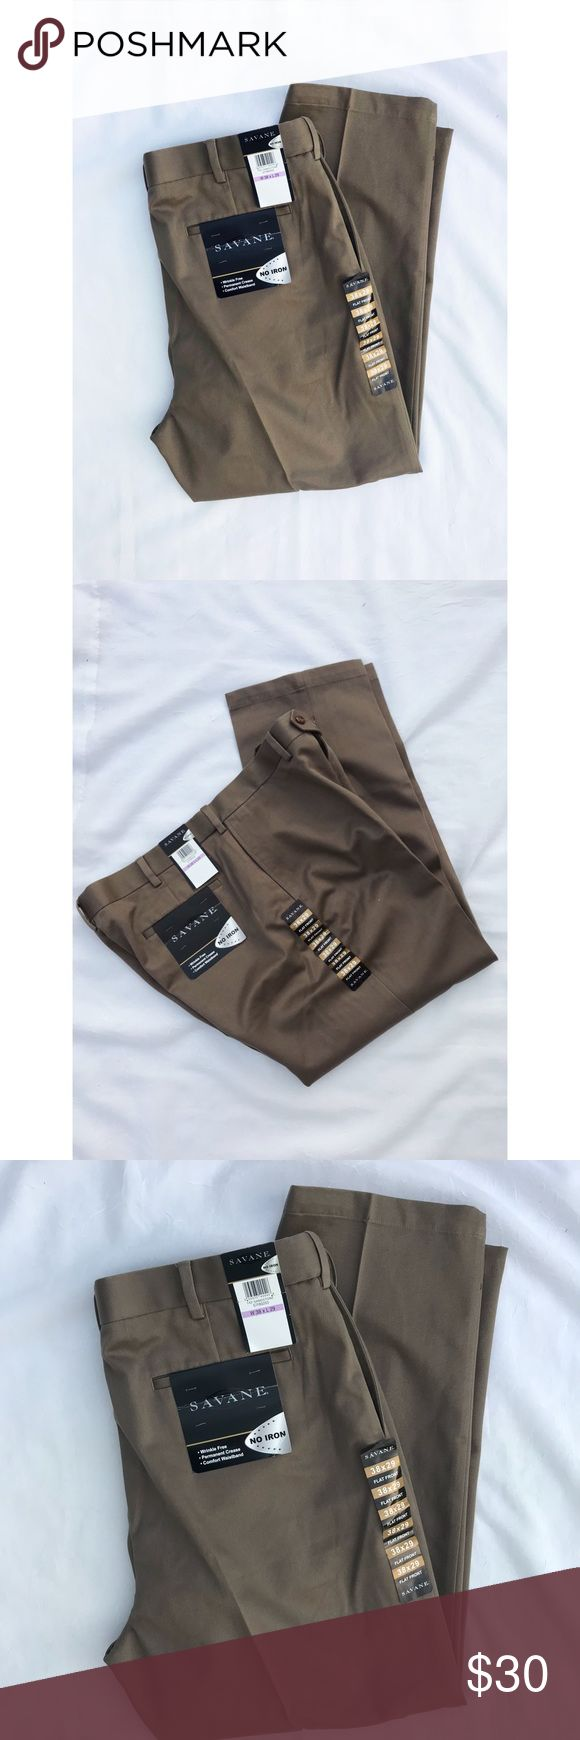 "NWT • Men's Dress Pants •Savane • 38x29 No iron  Wrinkle free Comfort waistband  Flat front  Mocha color  Savane  100% cotton Brand new with tags   29"" Inseam  J savane Pants Dress"